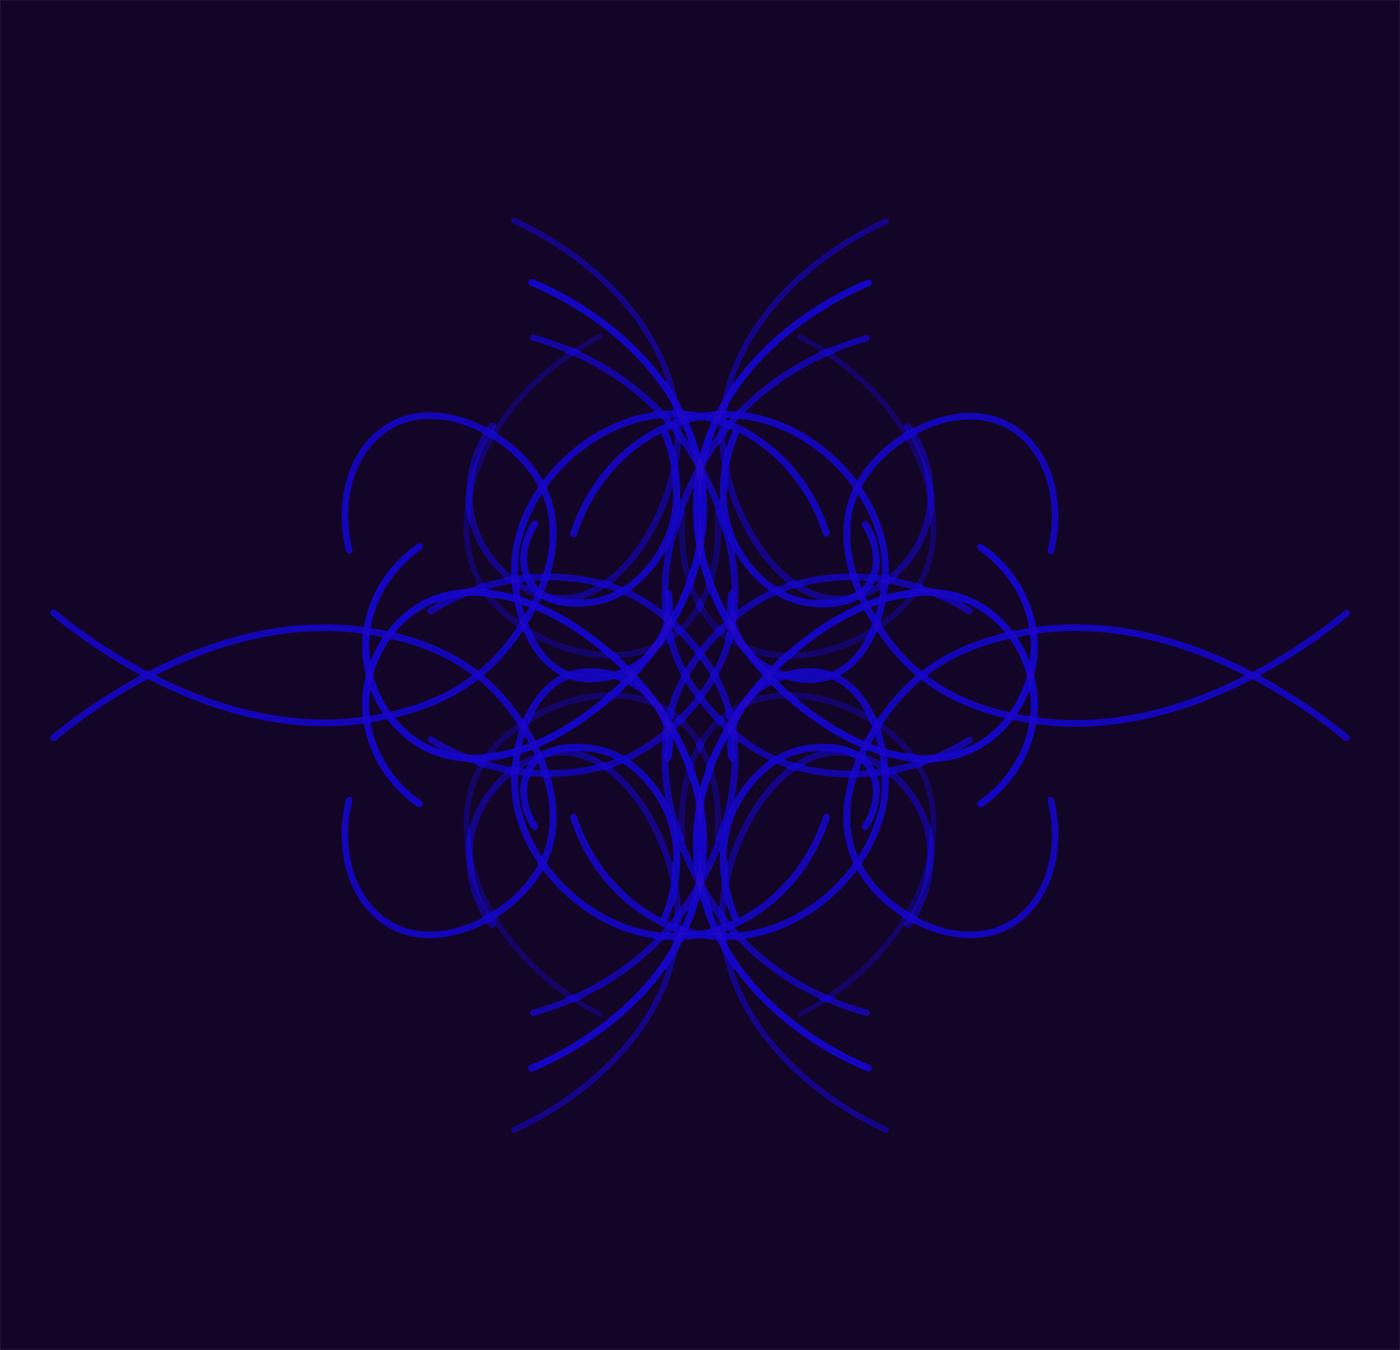 Randy Gibson's <em>Quadrilateral Starfield Symmetry Tx4 Base 7:144</em>